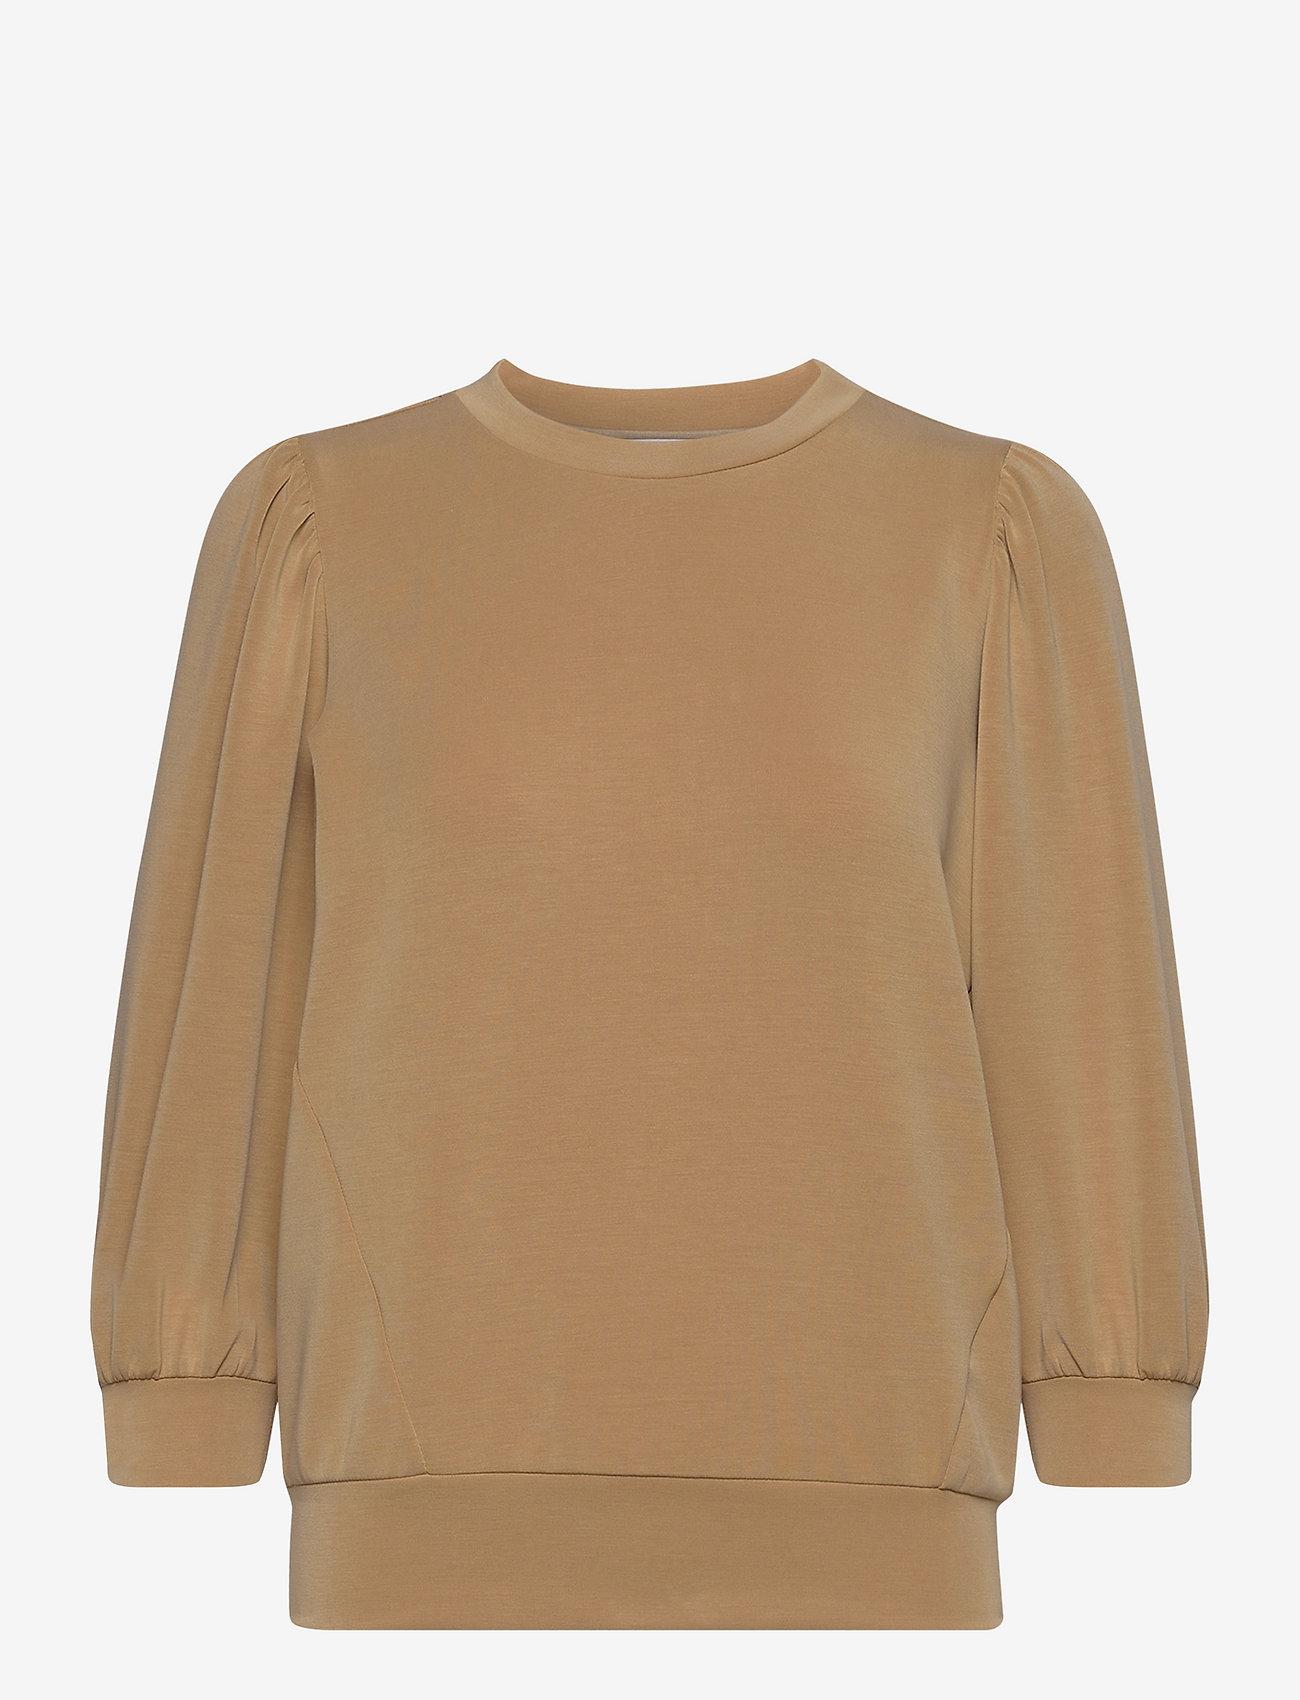 Selected Femme - SLFTENNY 3/4 SWEAT TOP - sweatshirts - tannin - 0